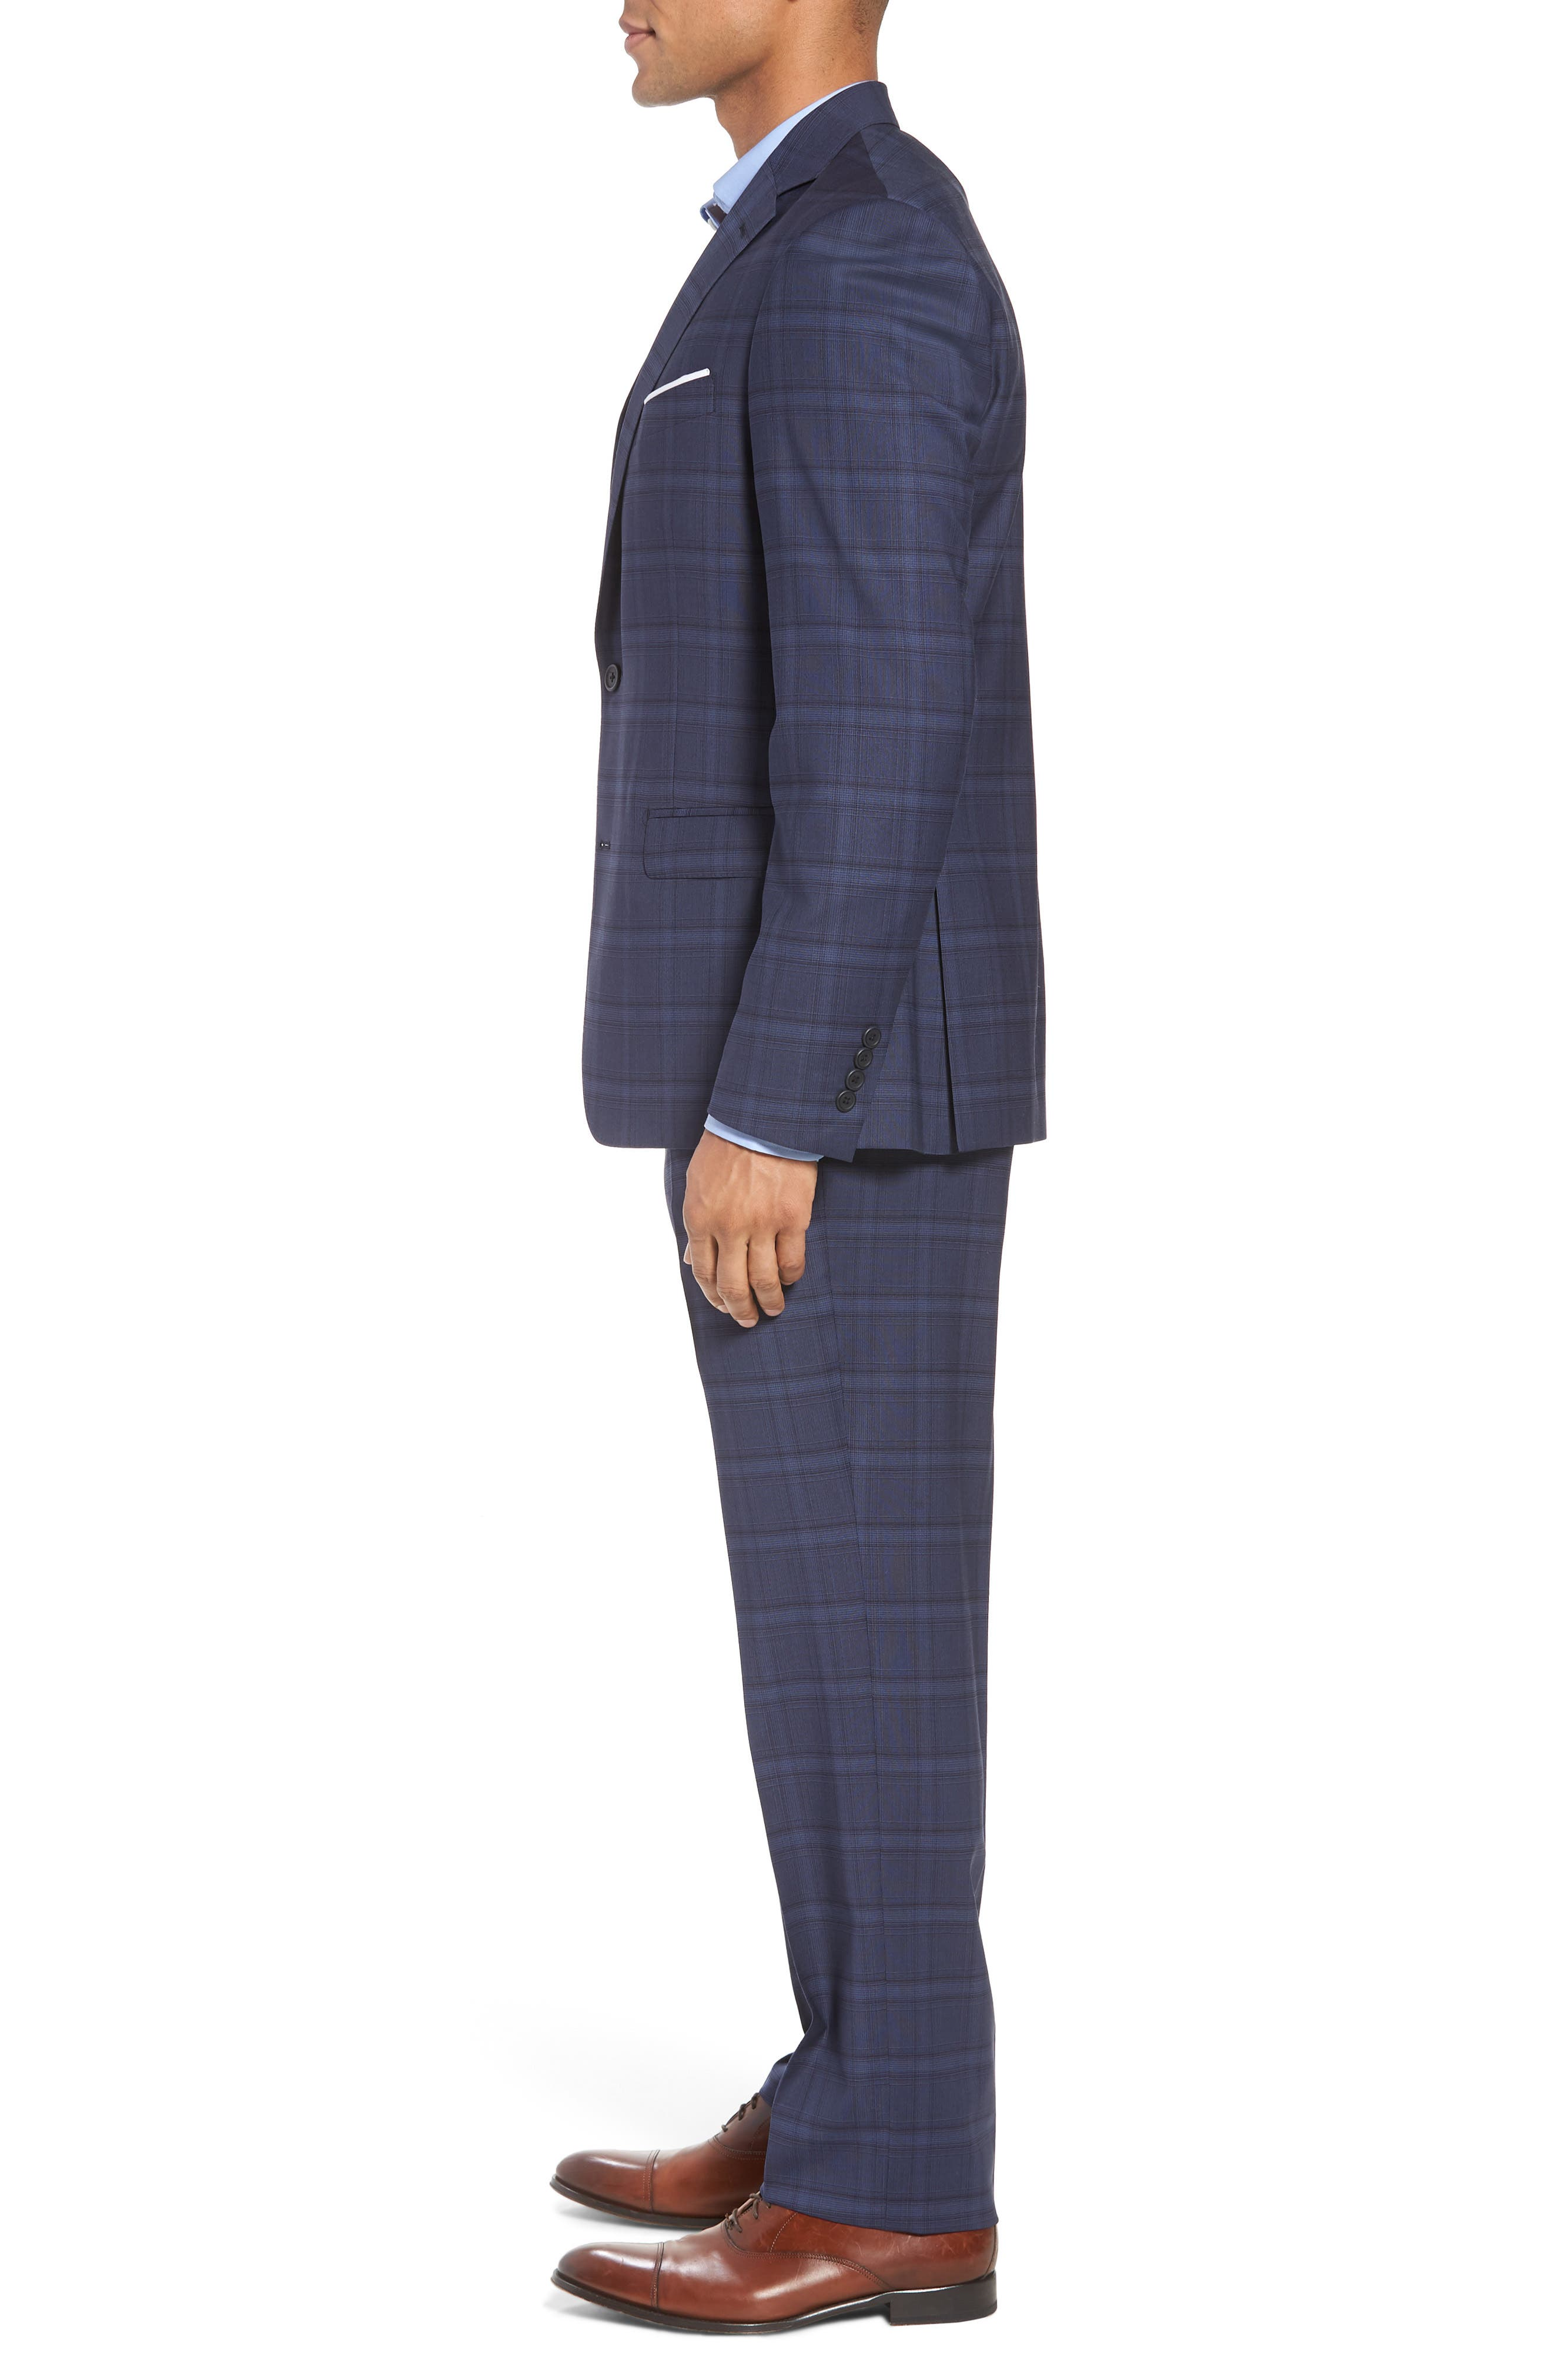 Alternate Image 3  - Nordstrom Men's Shop Trim Fit Plaid Stretch Wool Travel Suit